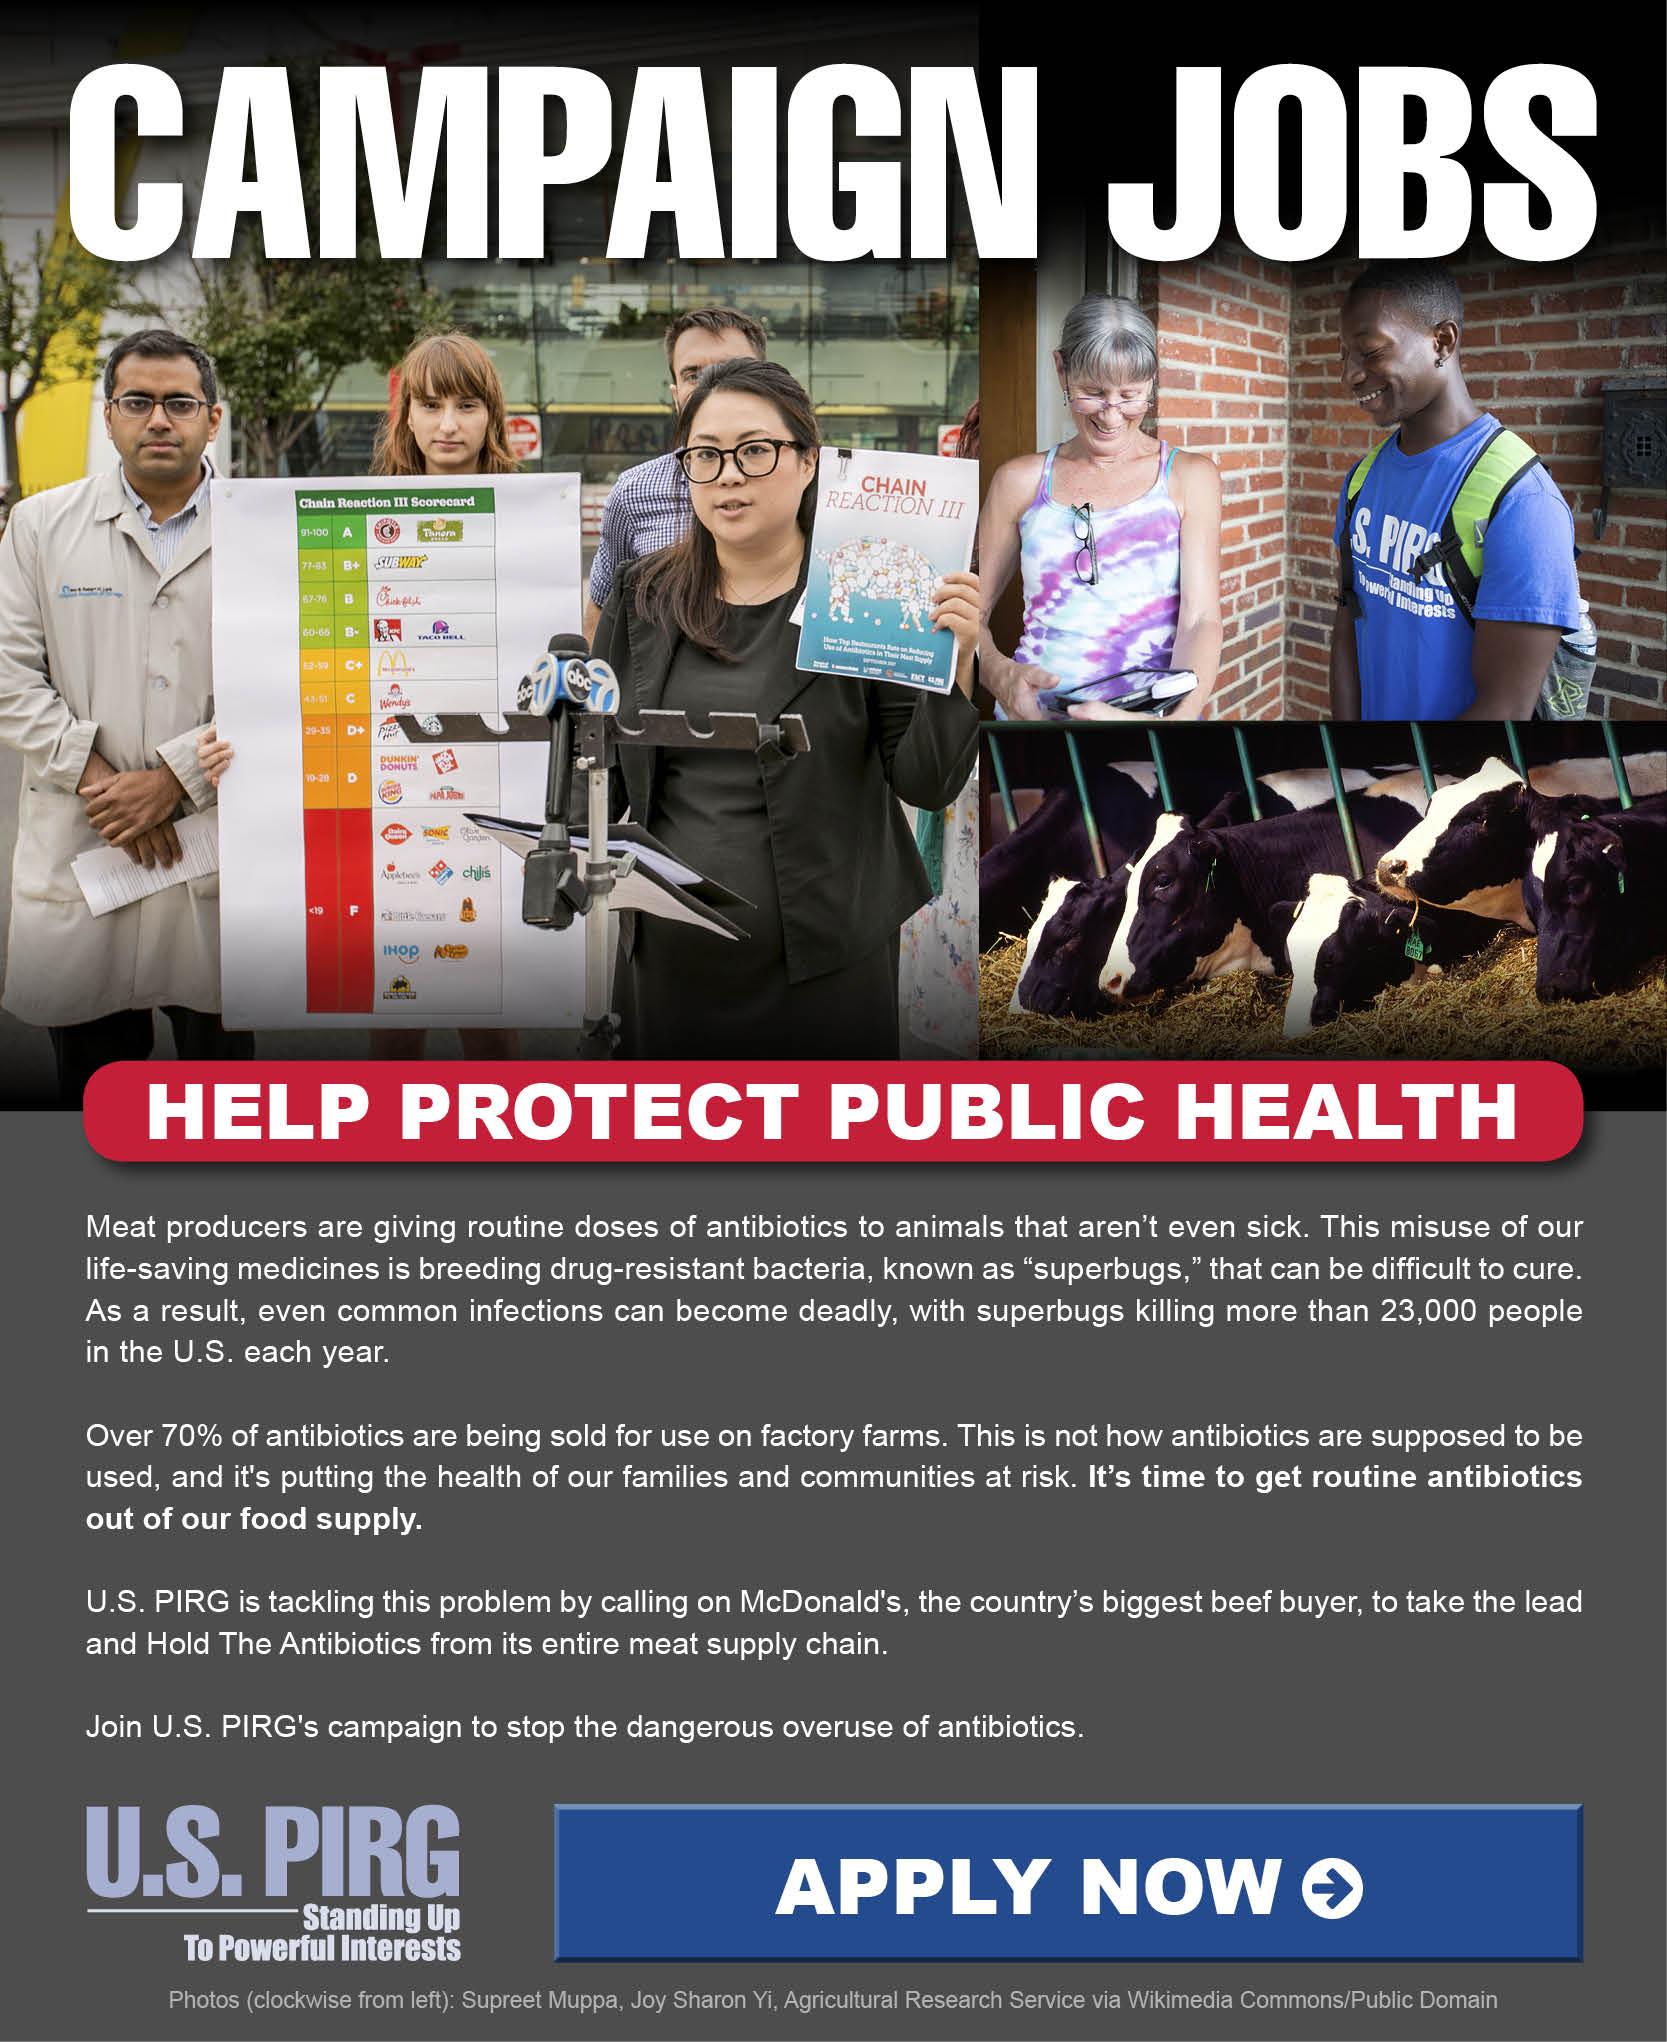 Help Protect Public Health.